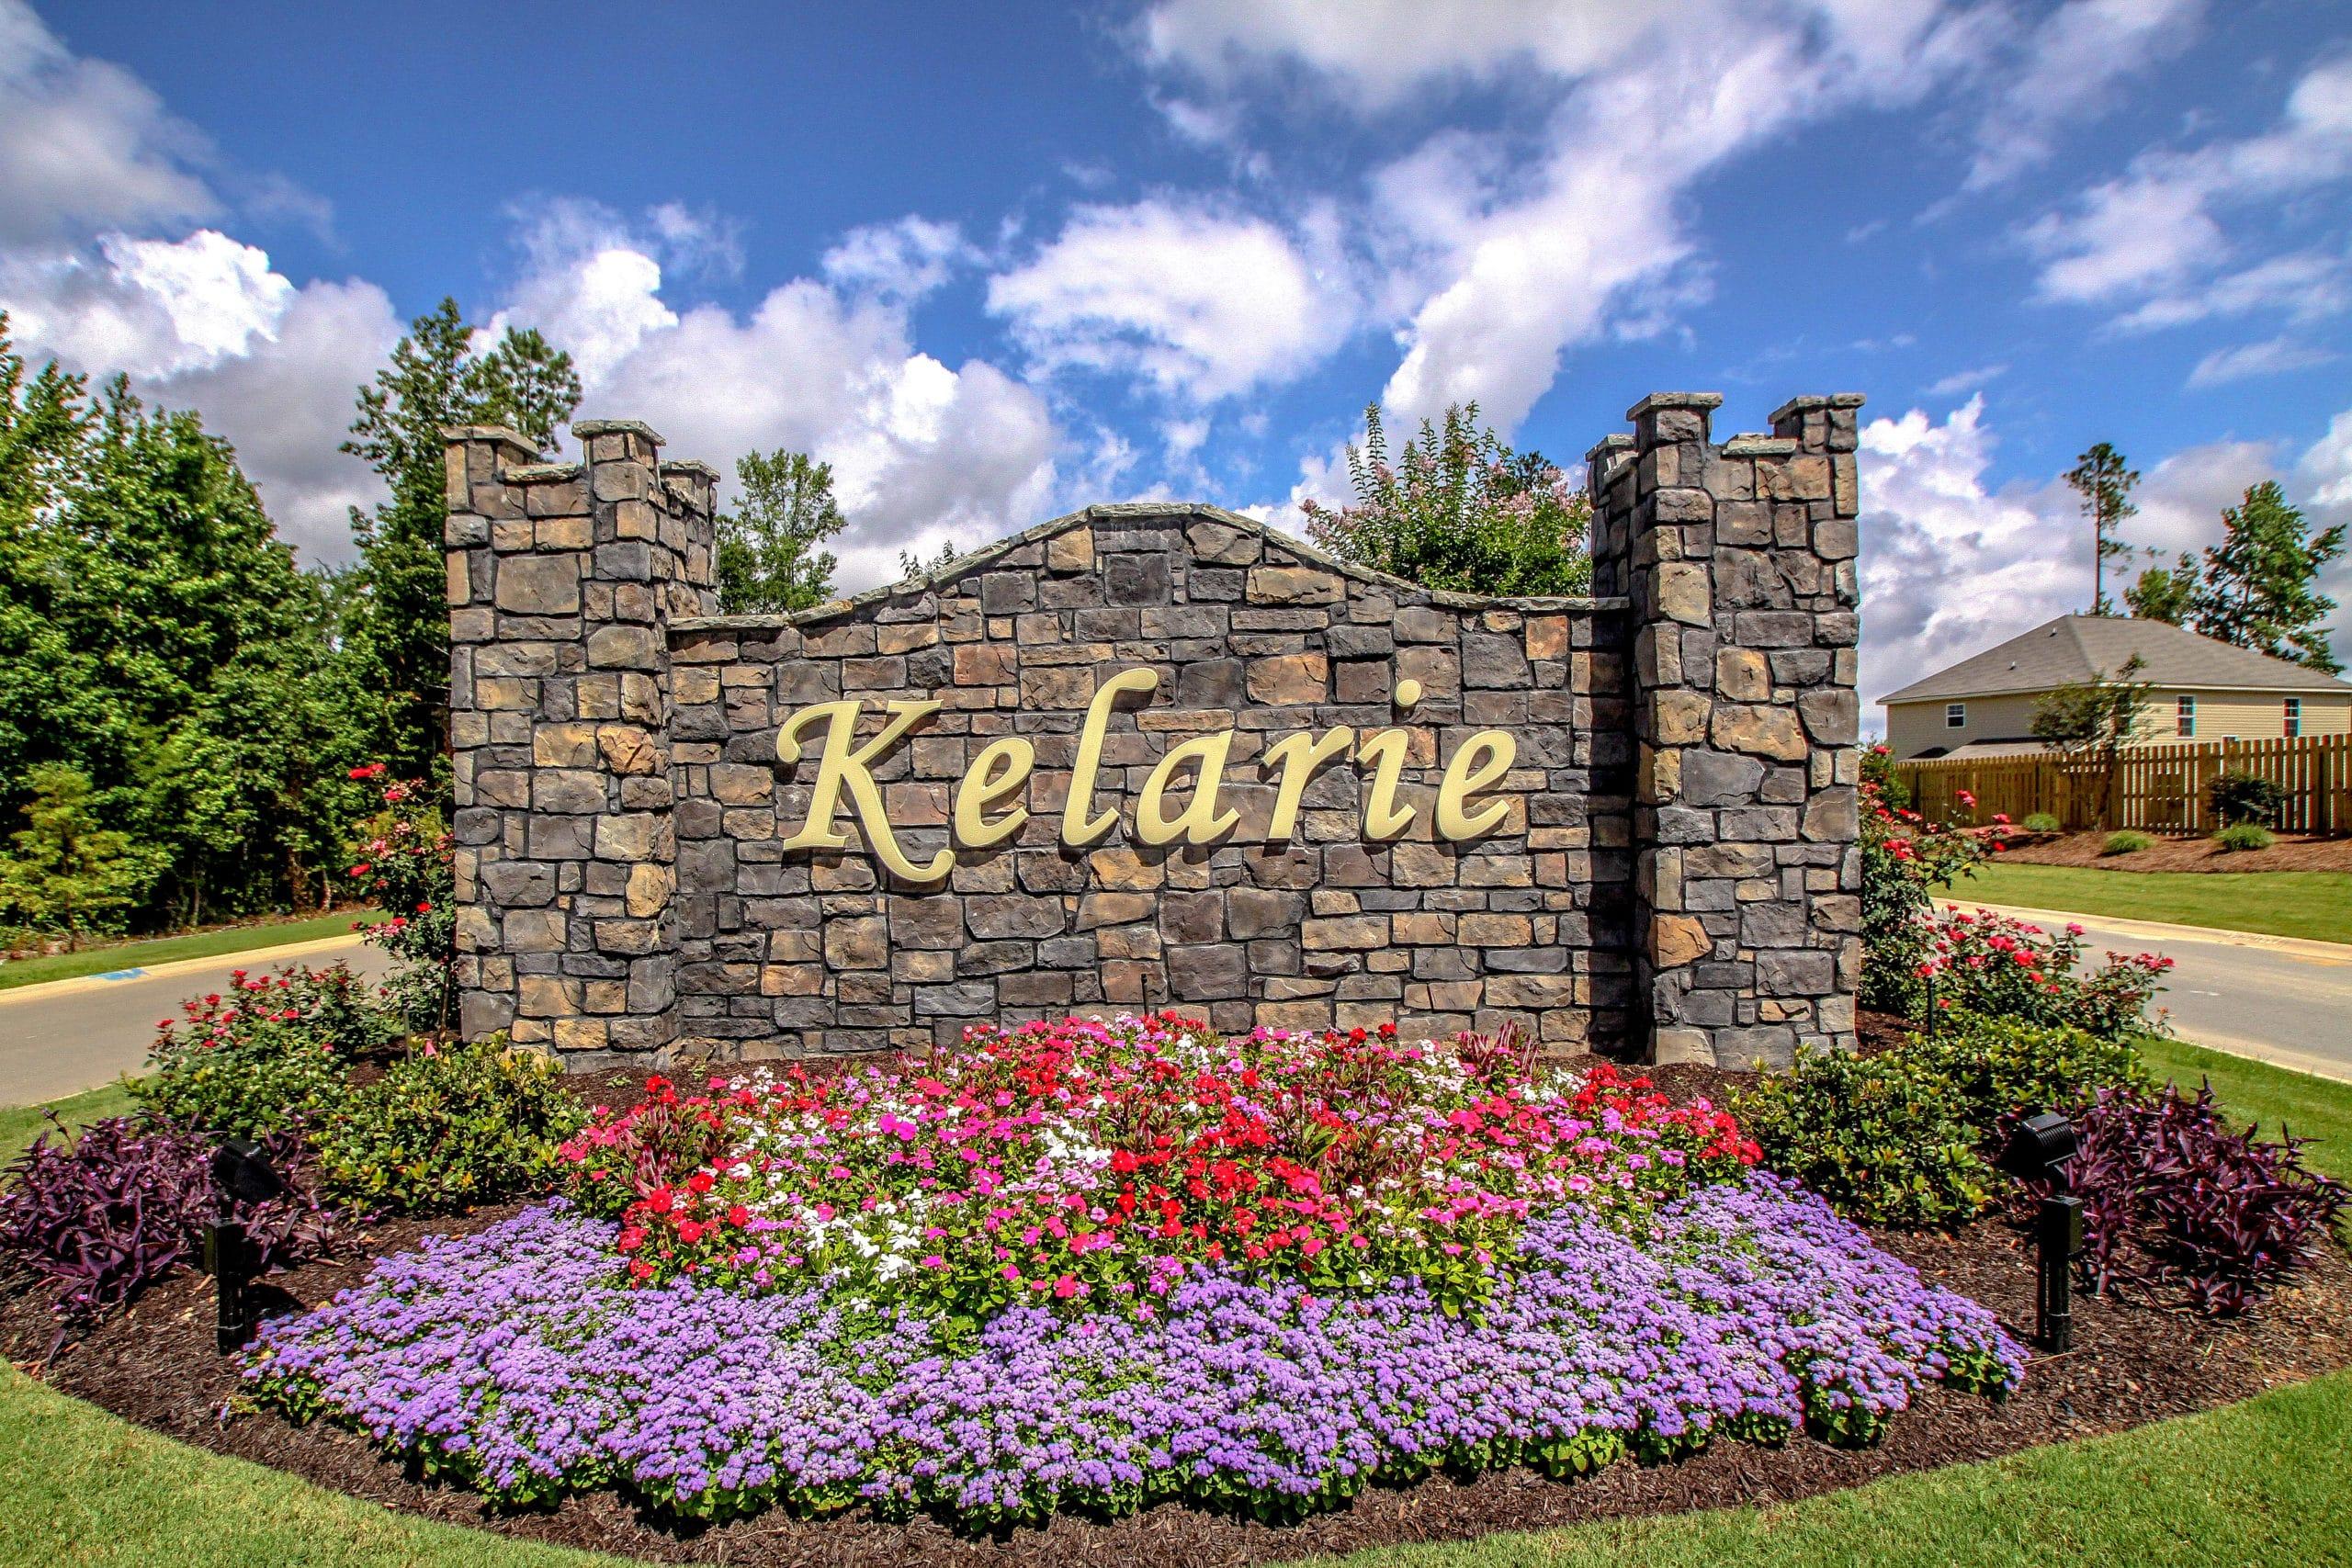 Kelarie entrance